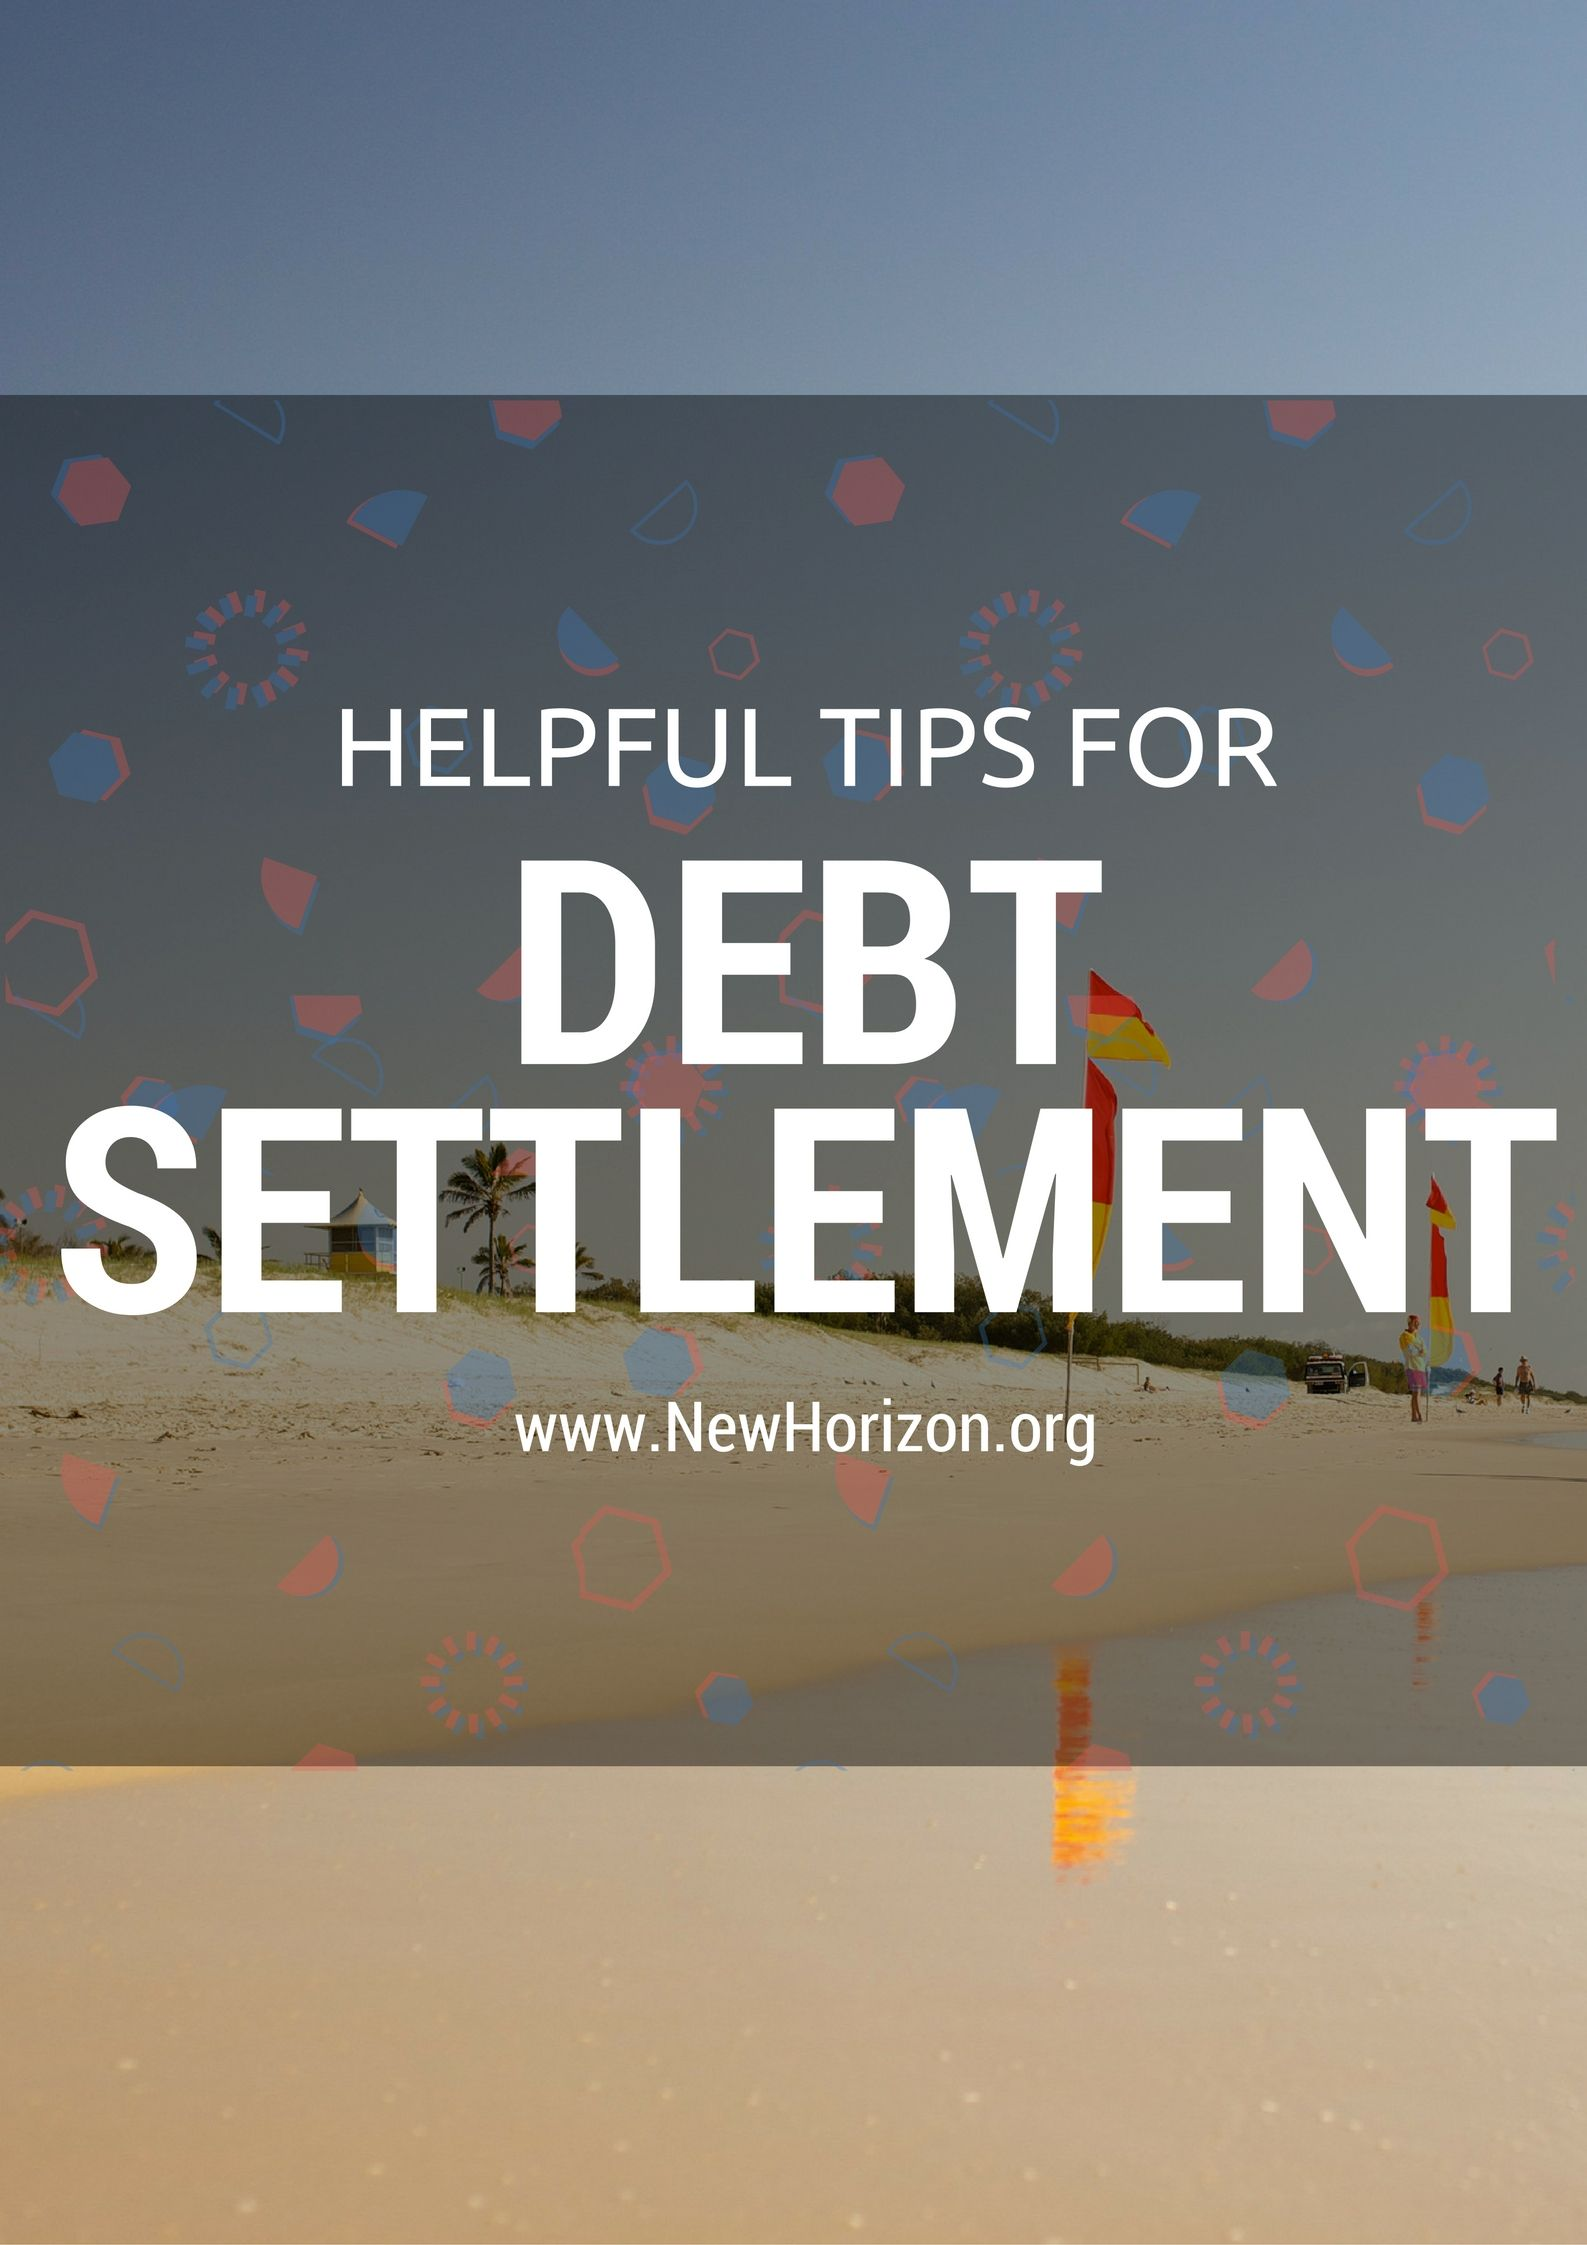 Helpful Tips for Debt Settlement Debt settlement, Debt